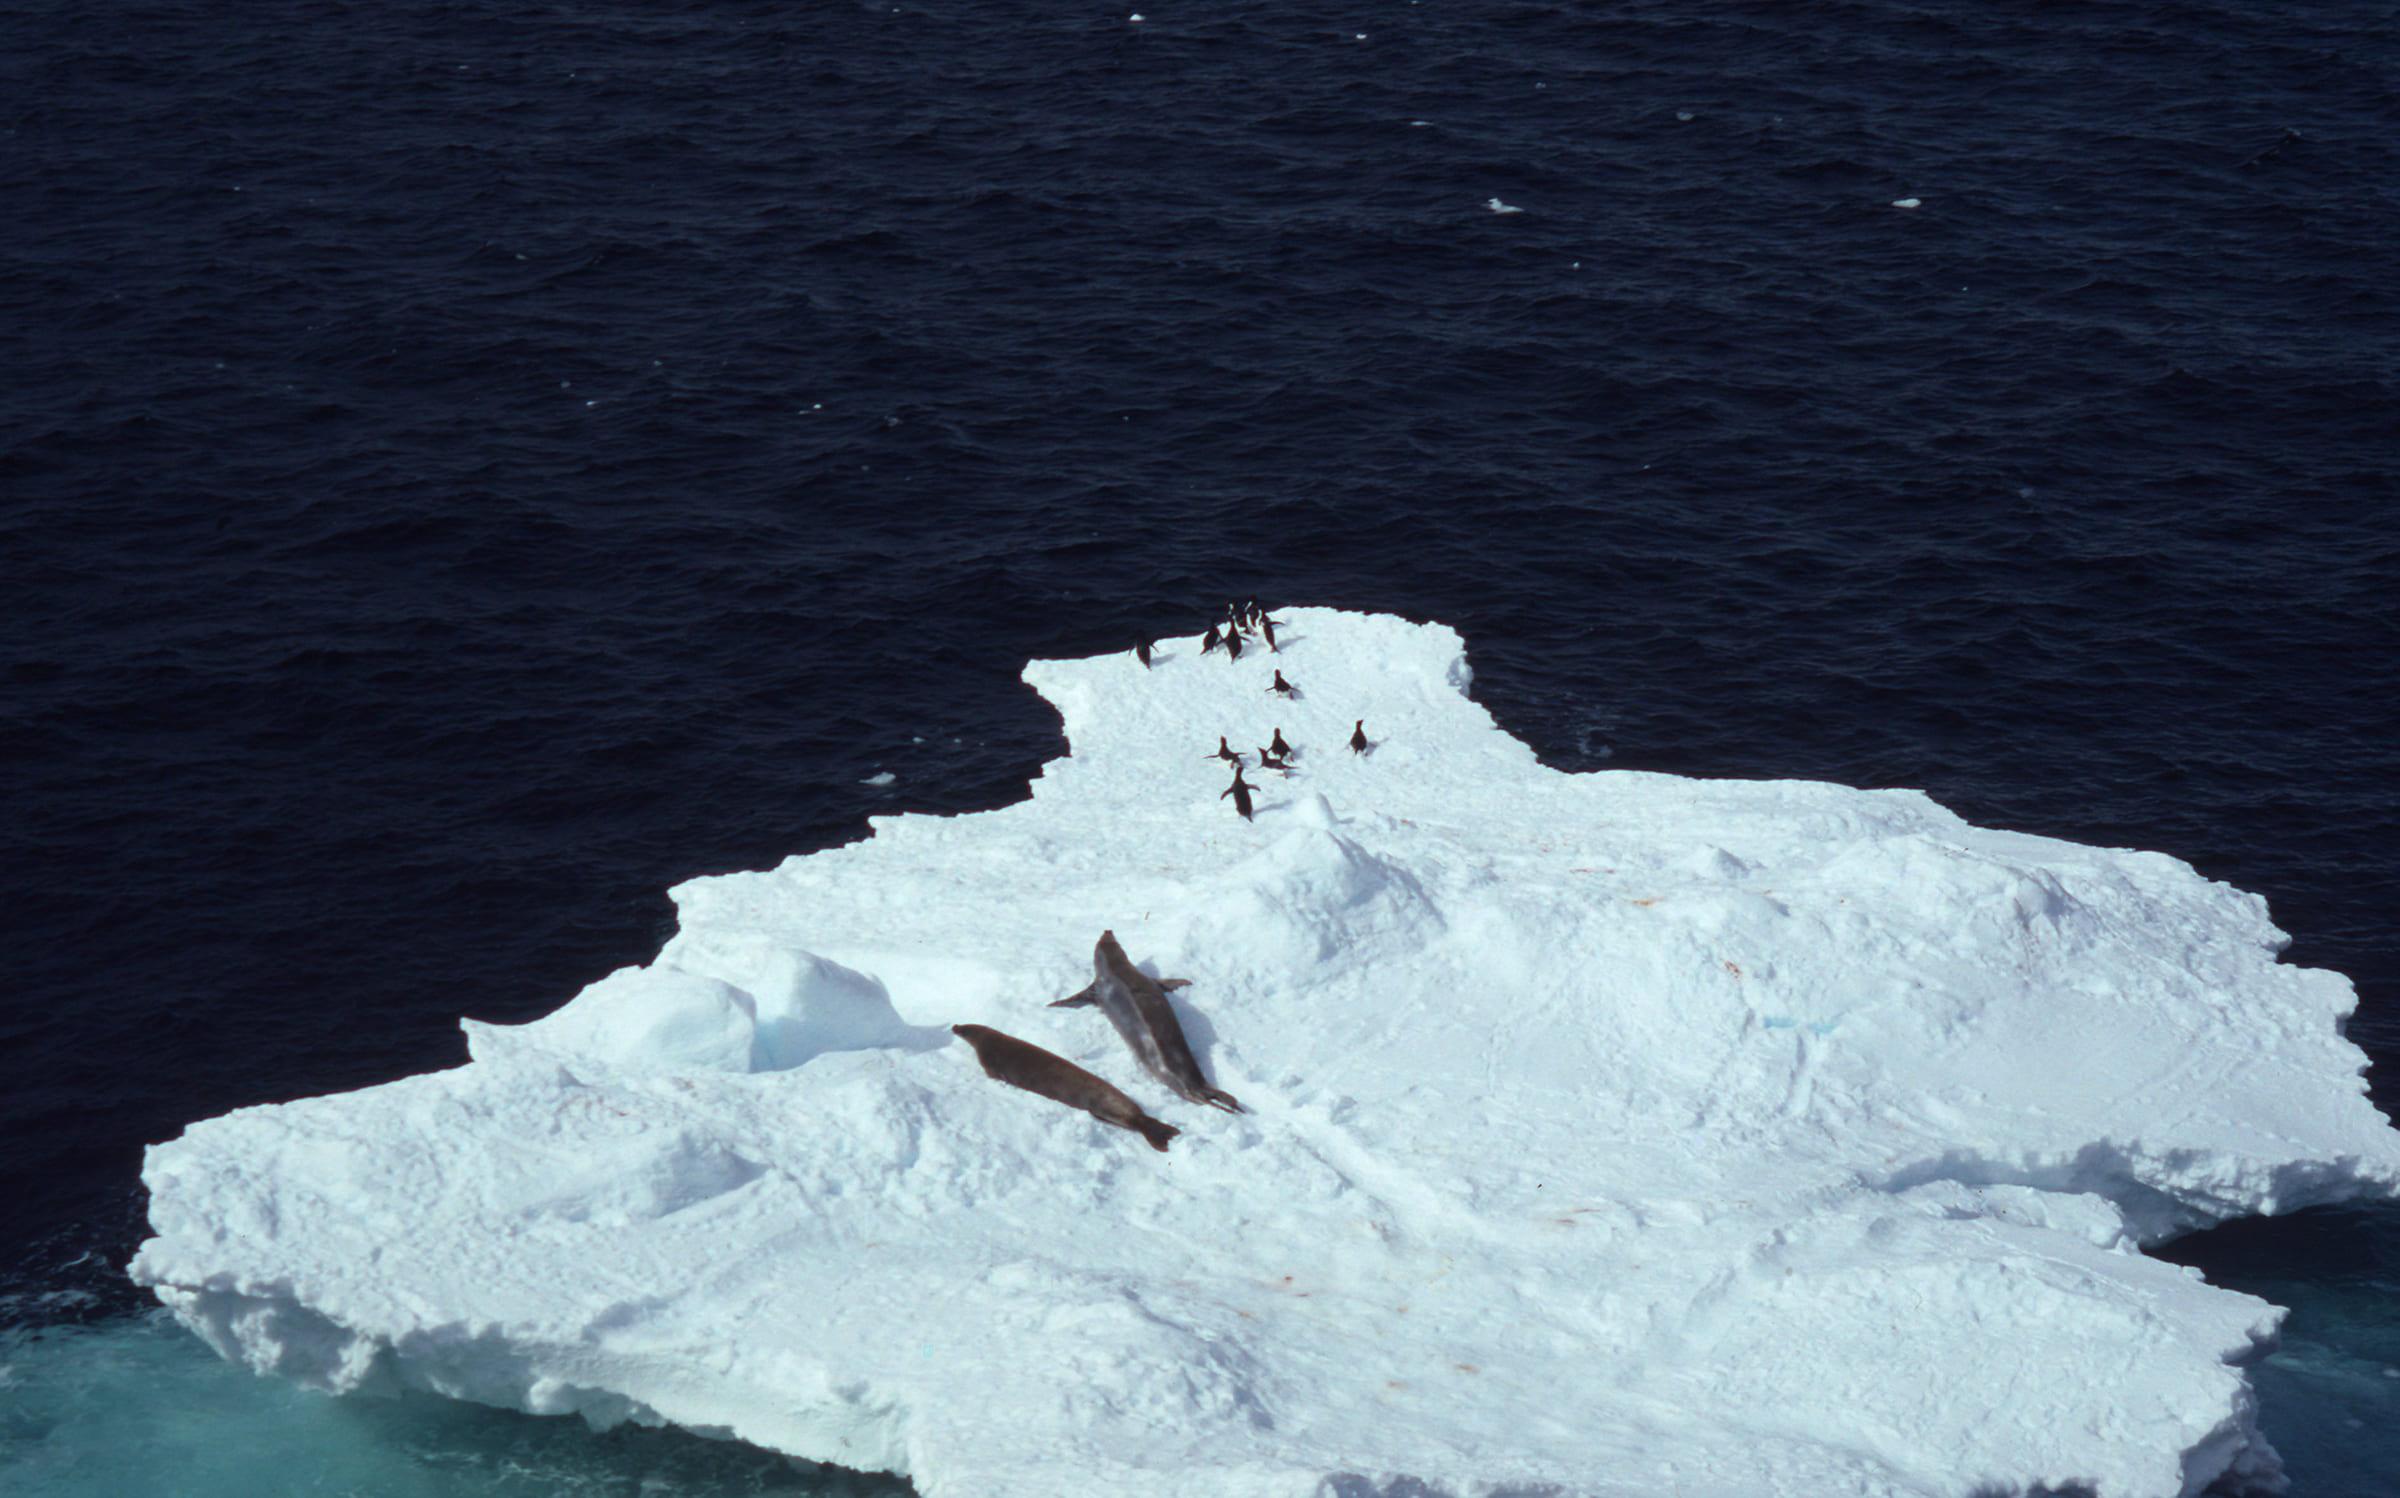 Adeliepinguine auf Eisscholle